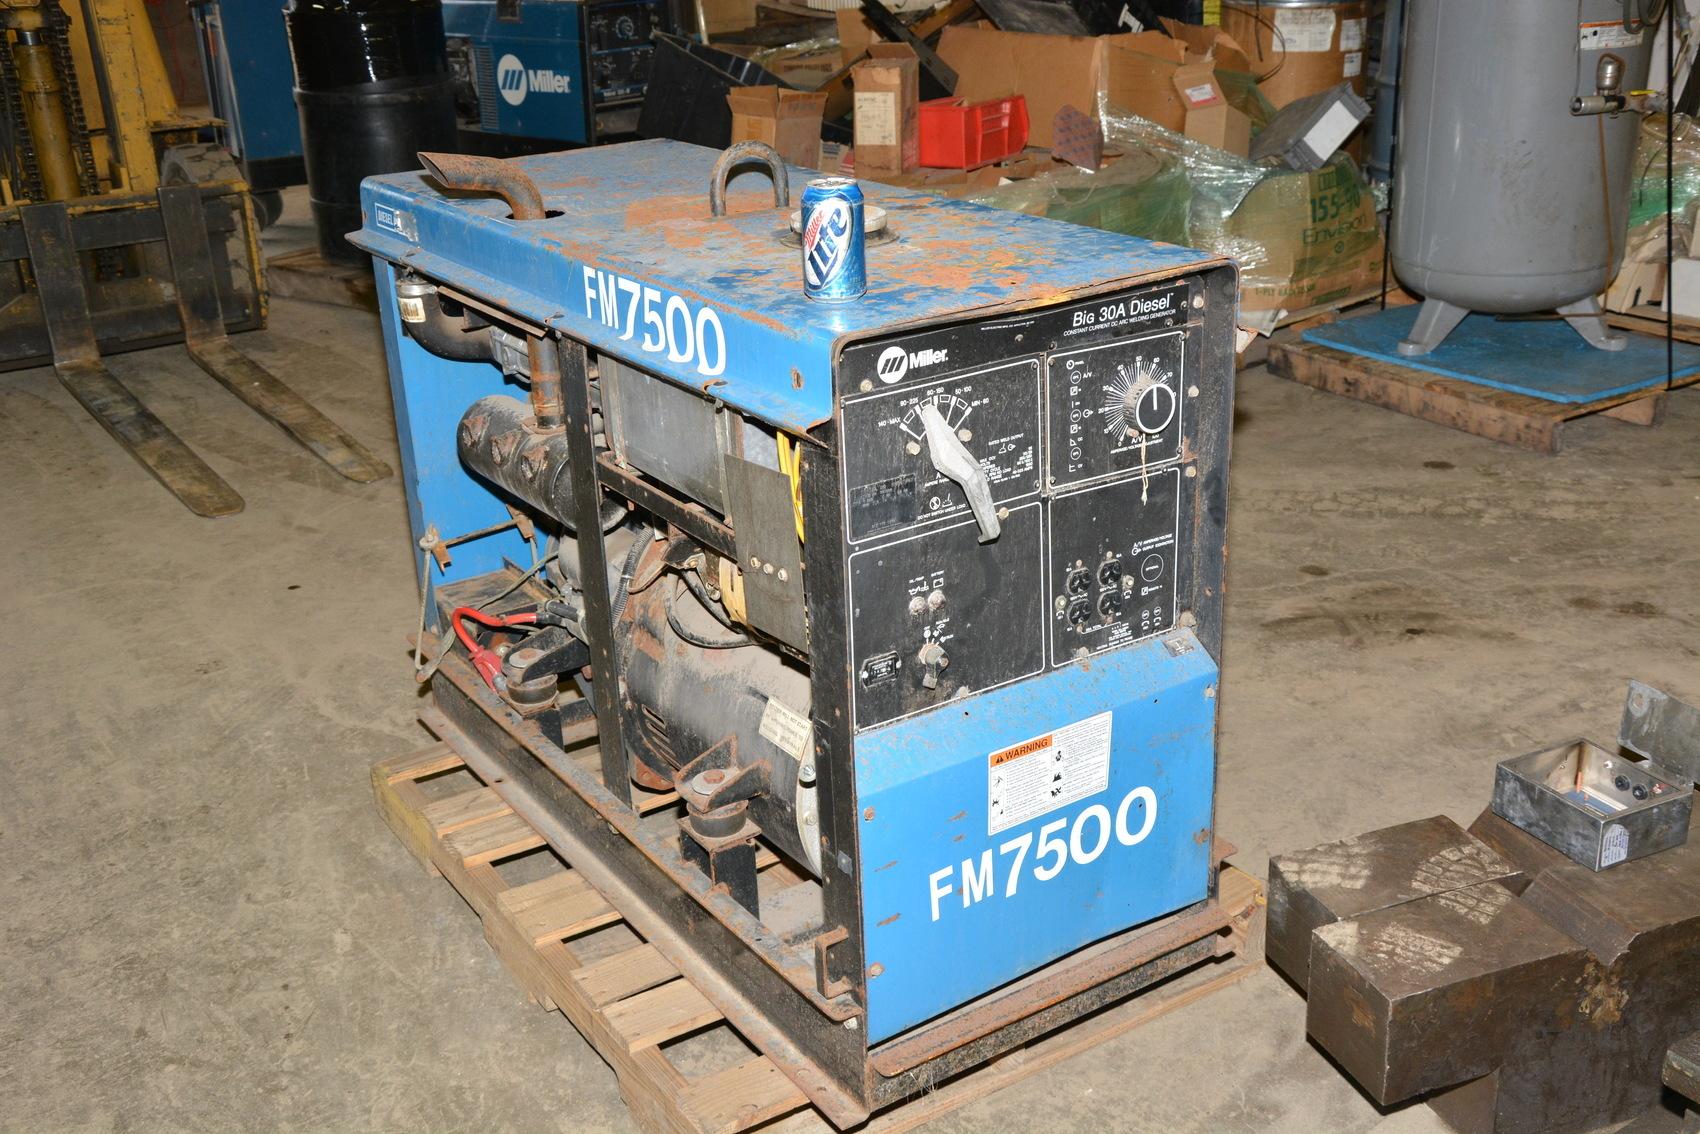 Miller BIG 30A DIESEL DC Stick Welder Generator F3L1011